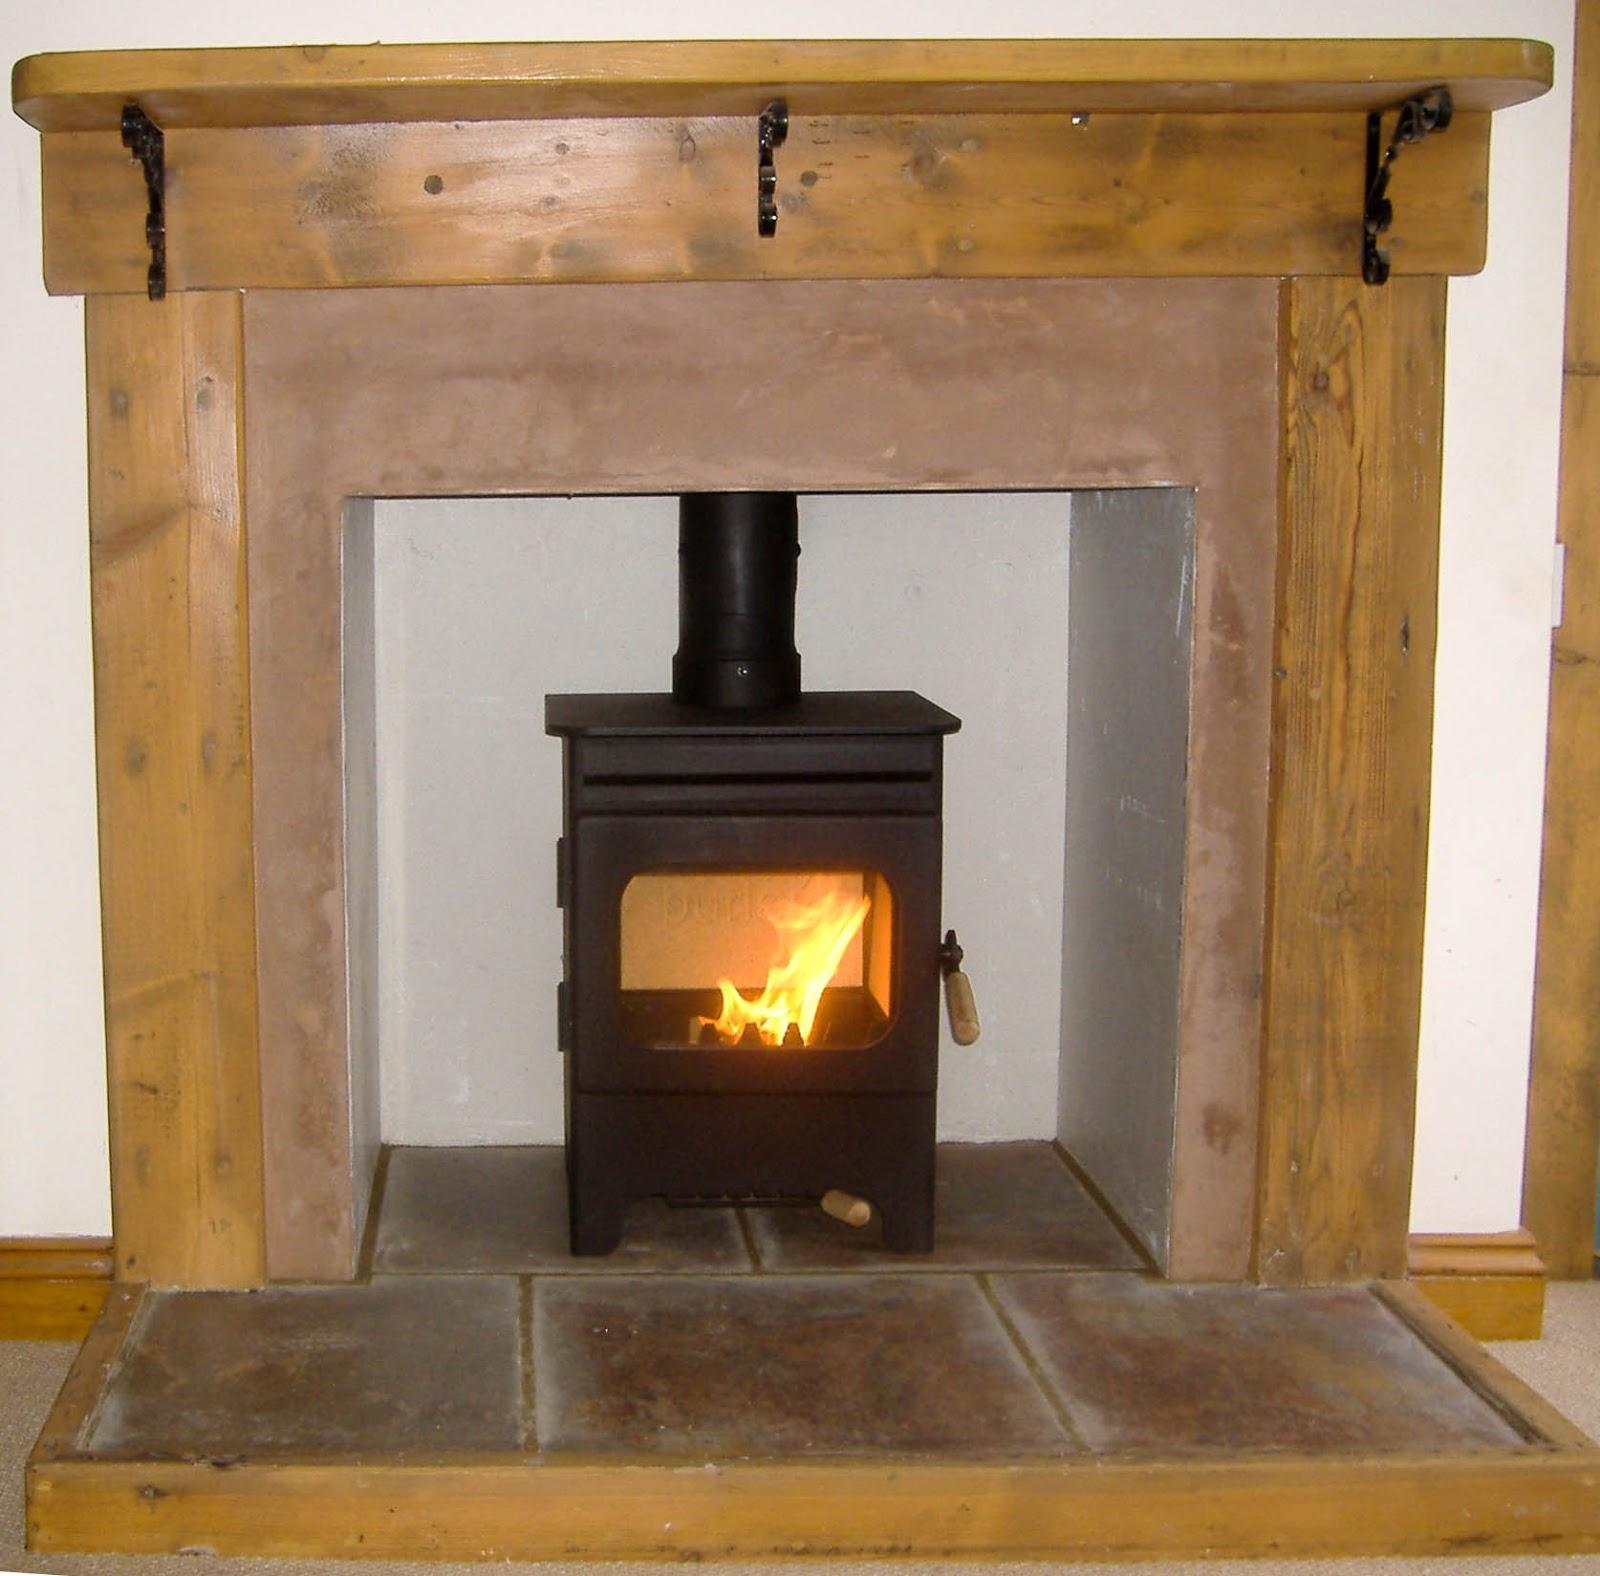 NaturalHeating.com - Wood Burning & Multi Fuel Stoves